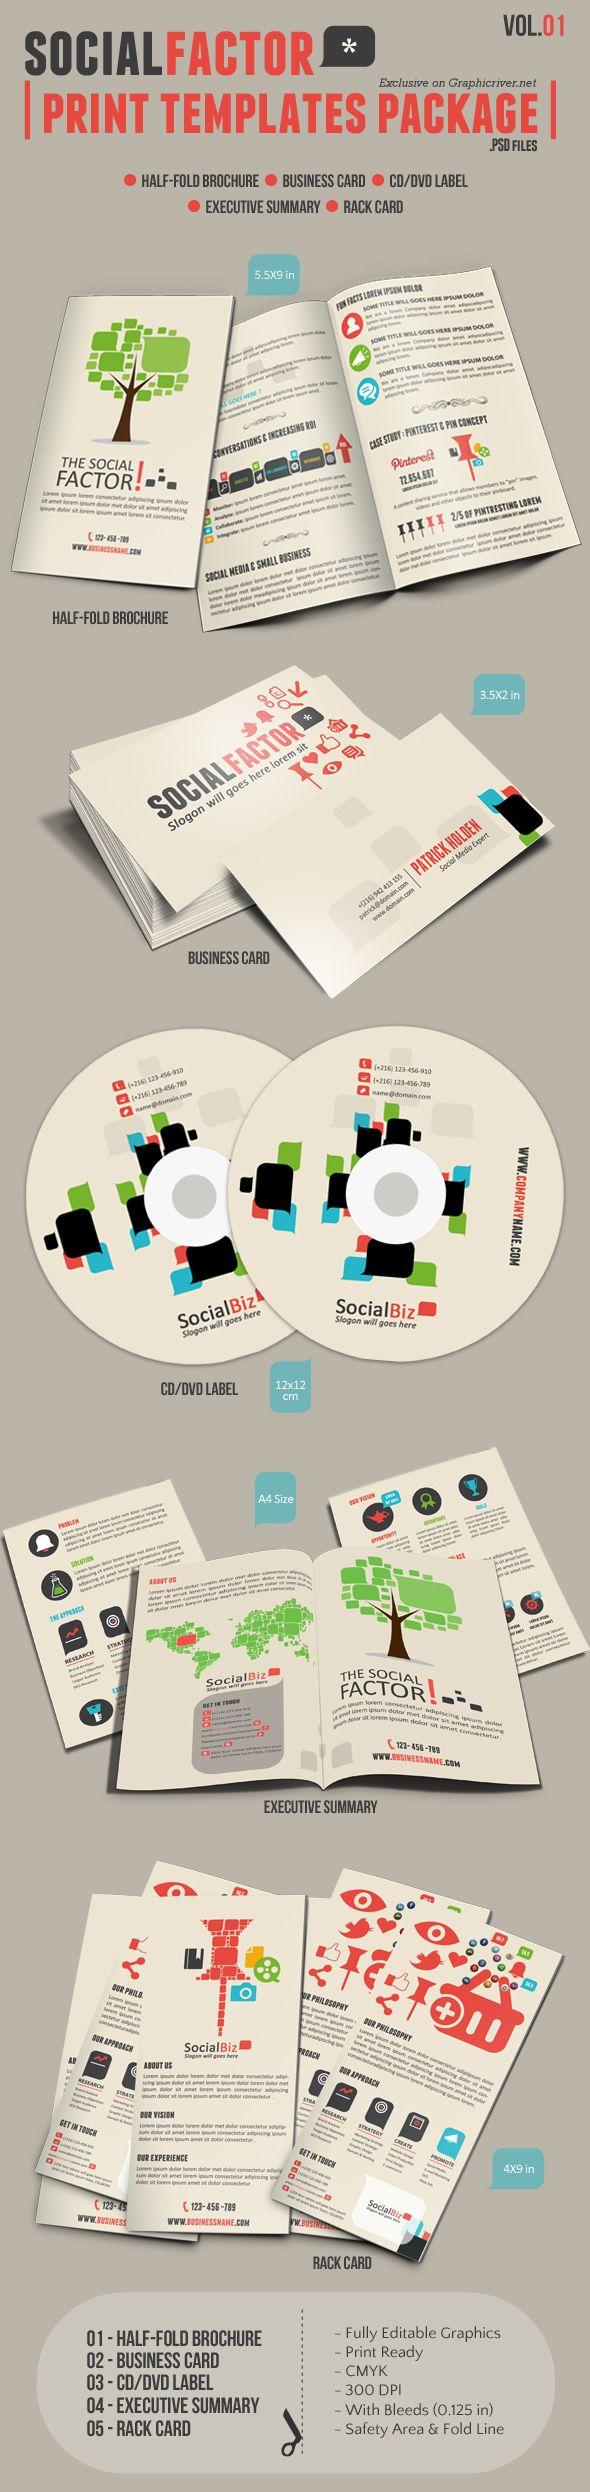 Cassandra cappello graphic design toronto - Find This Pin And More On Design Print Editorial